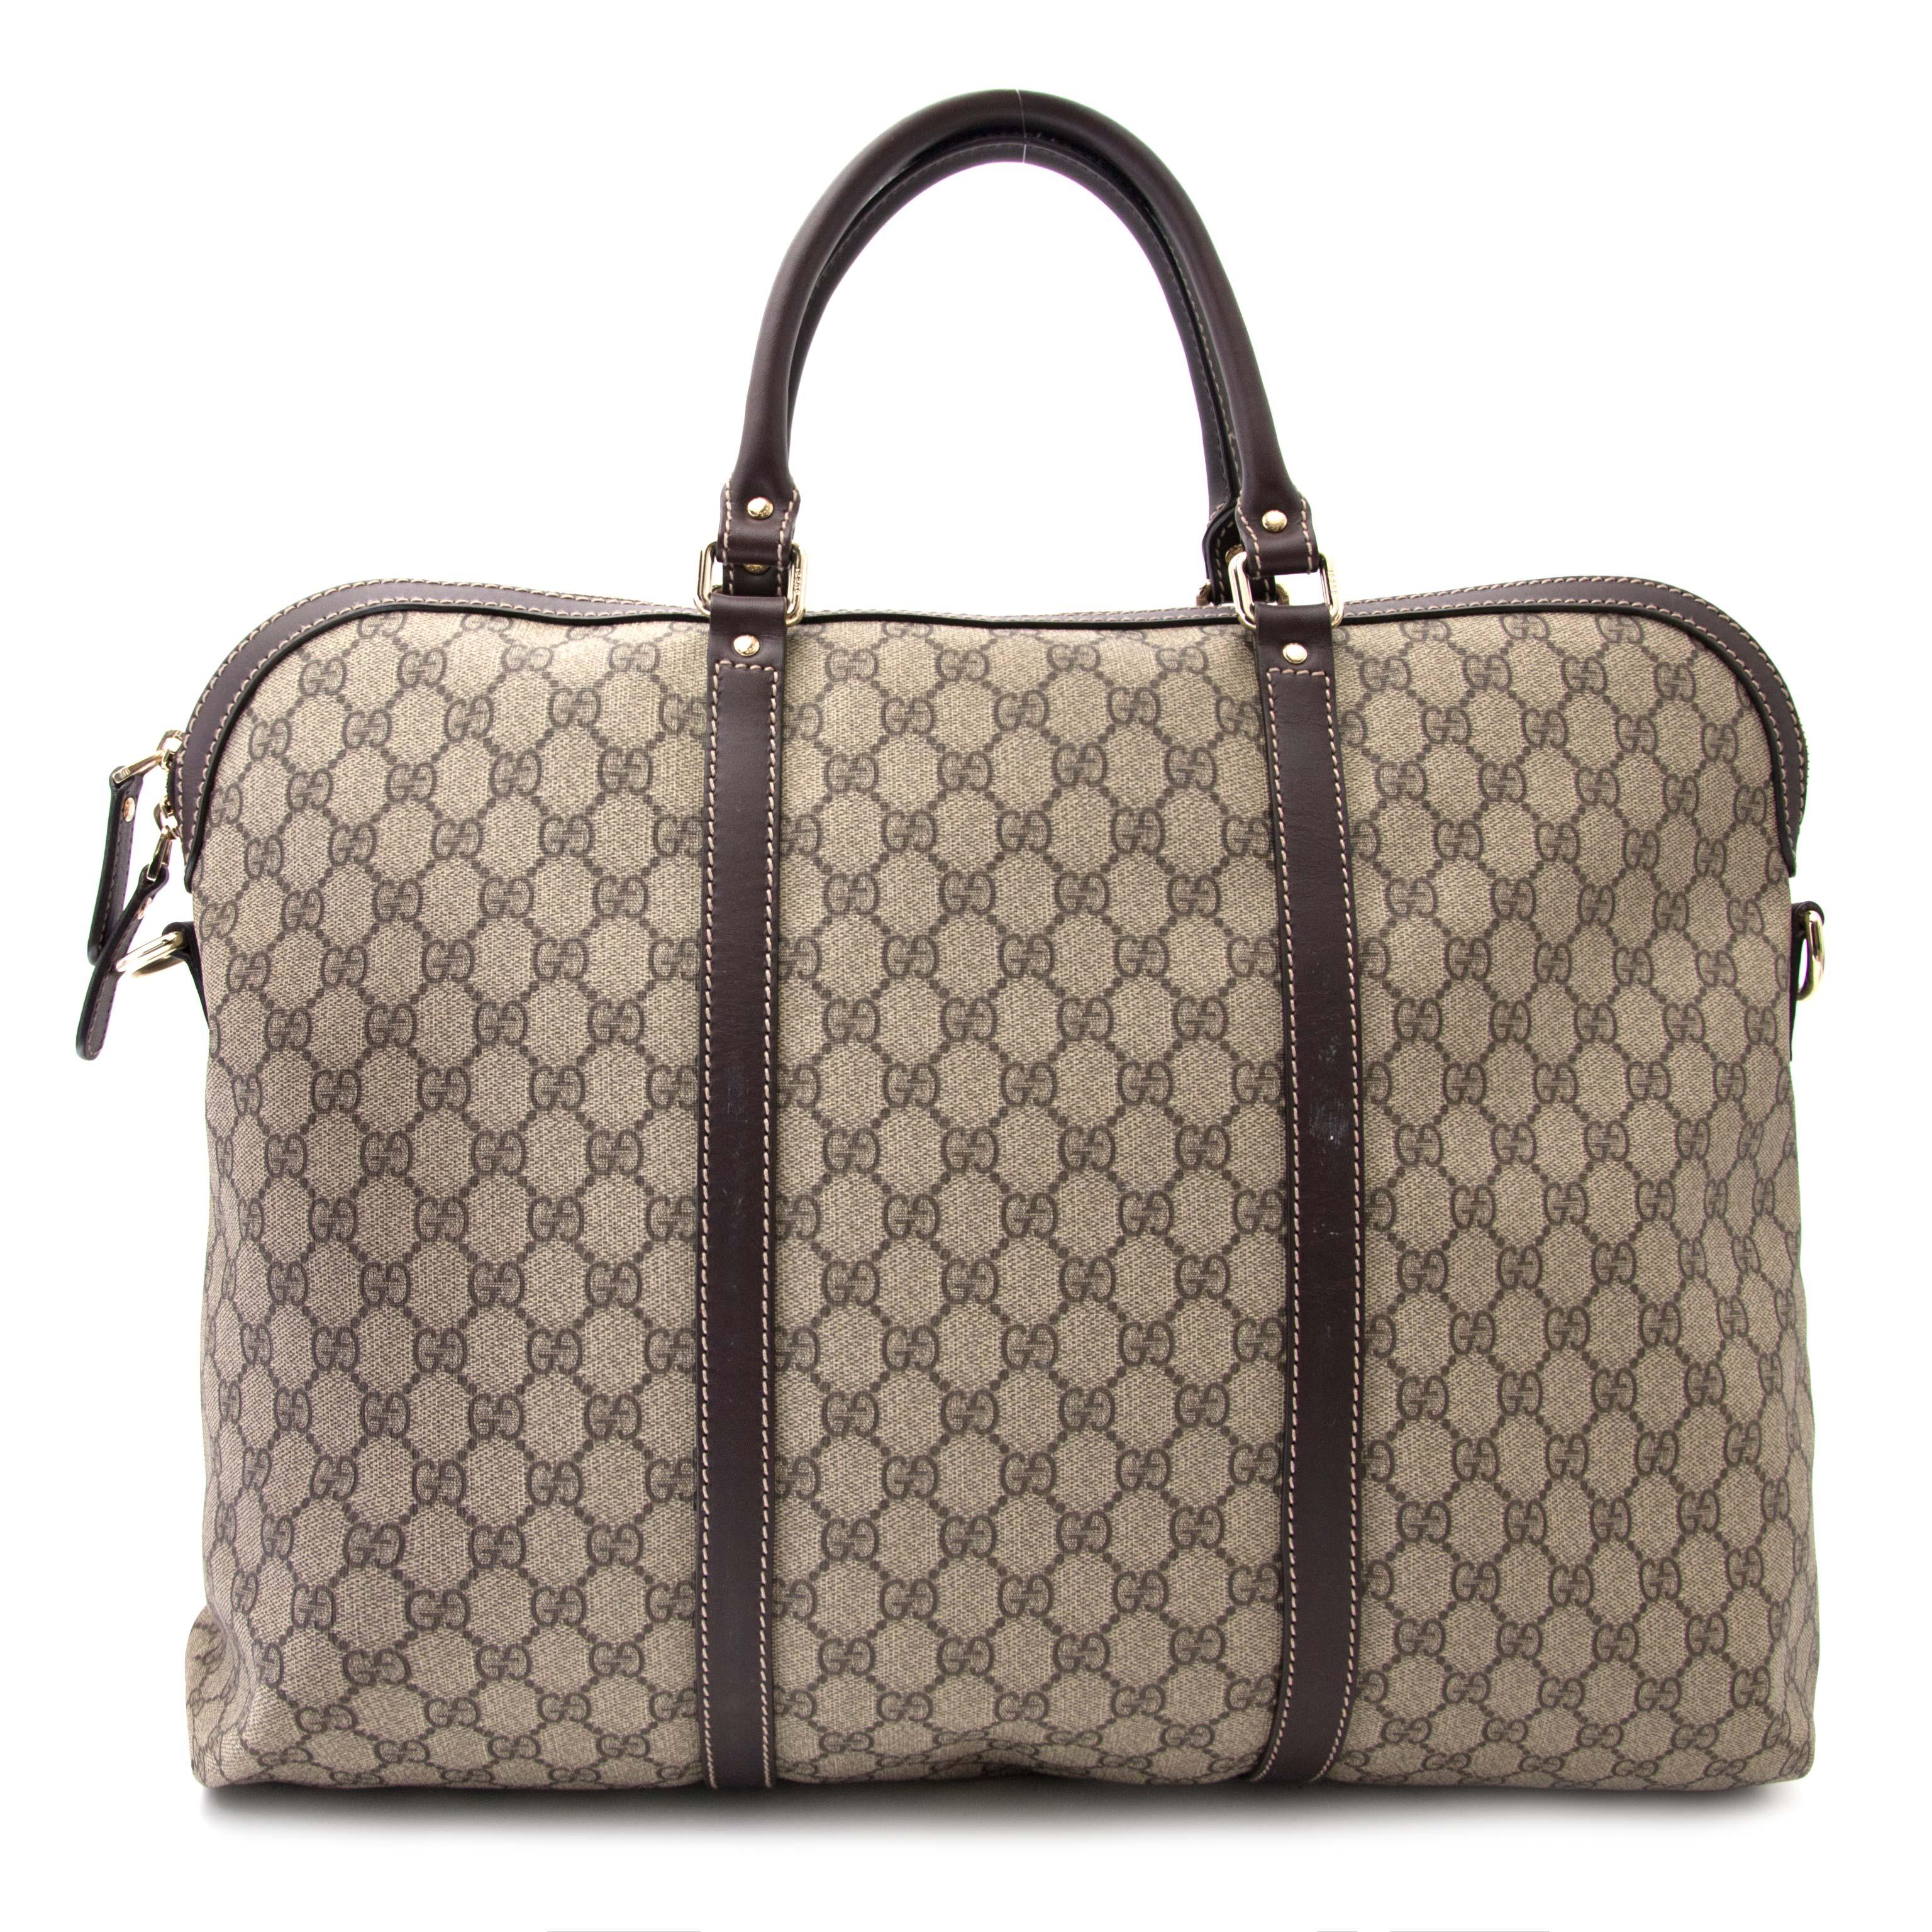 da7214fee06113 Labellov Buy authentic vintagePrada designer bags, shoes, clothes ...